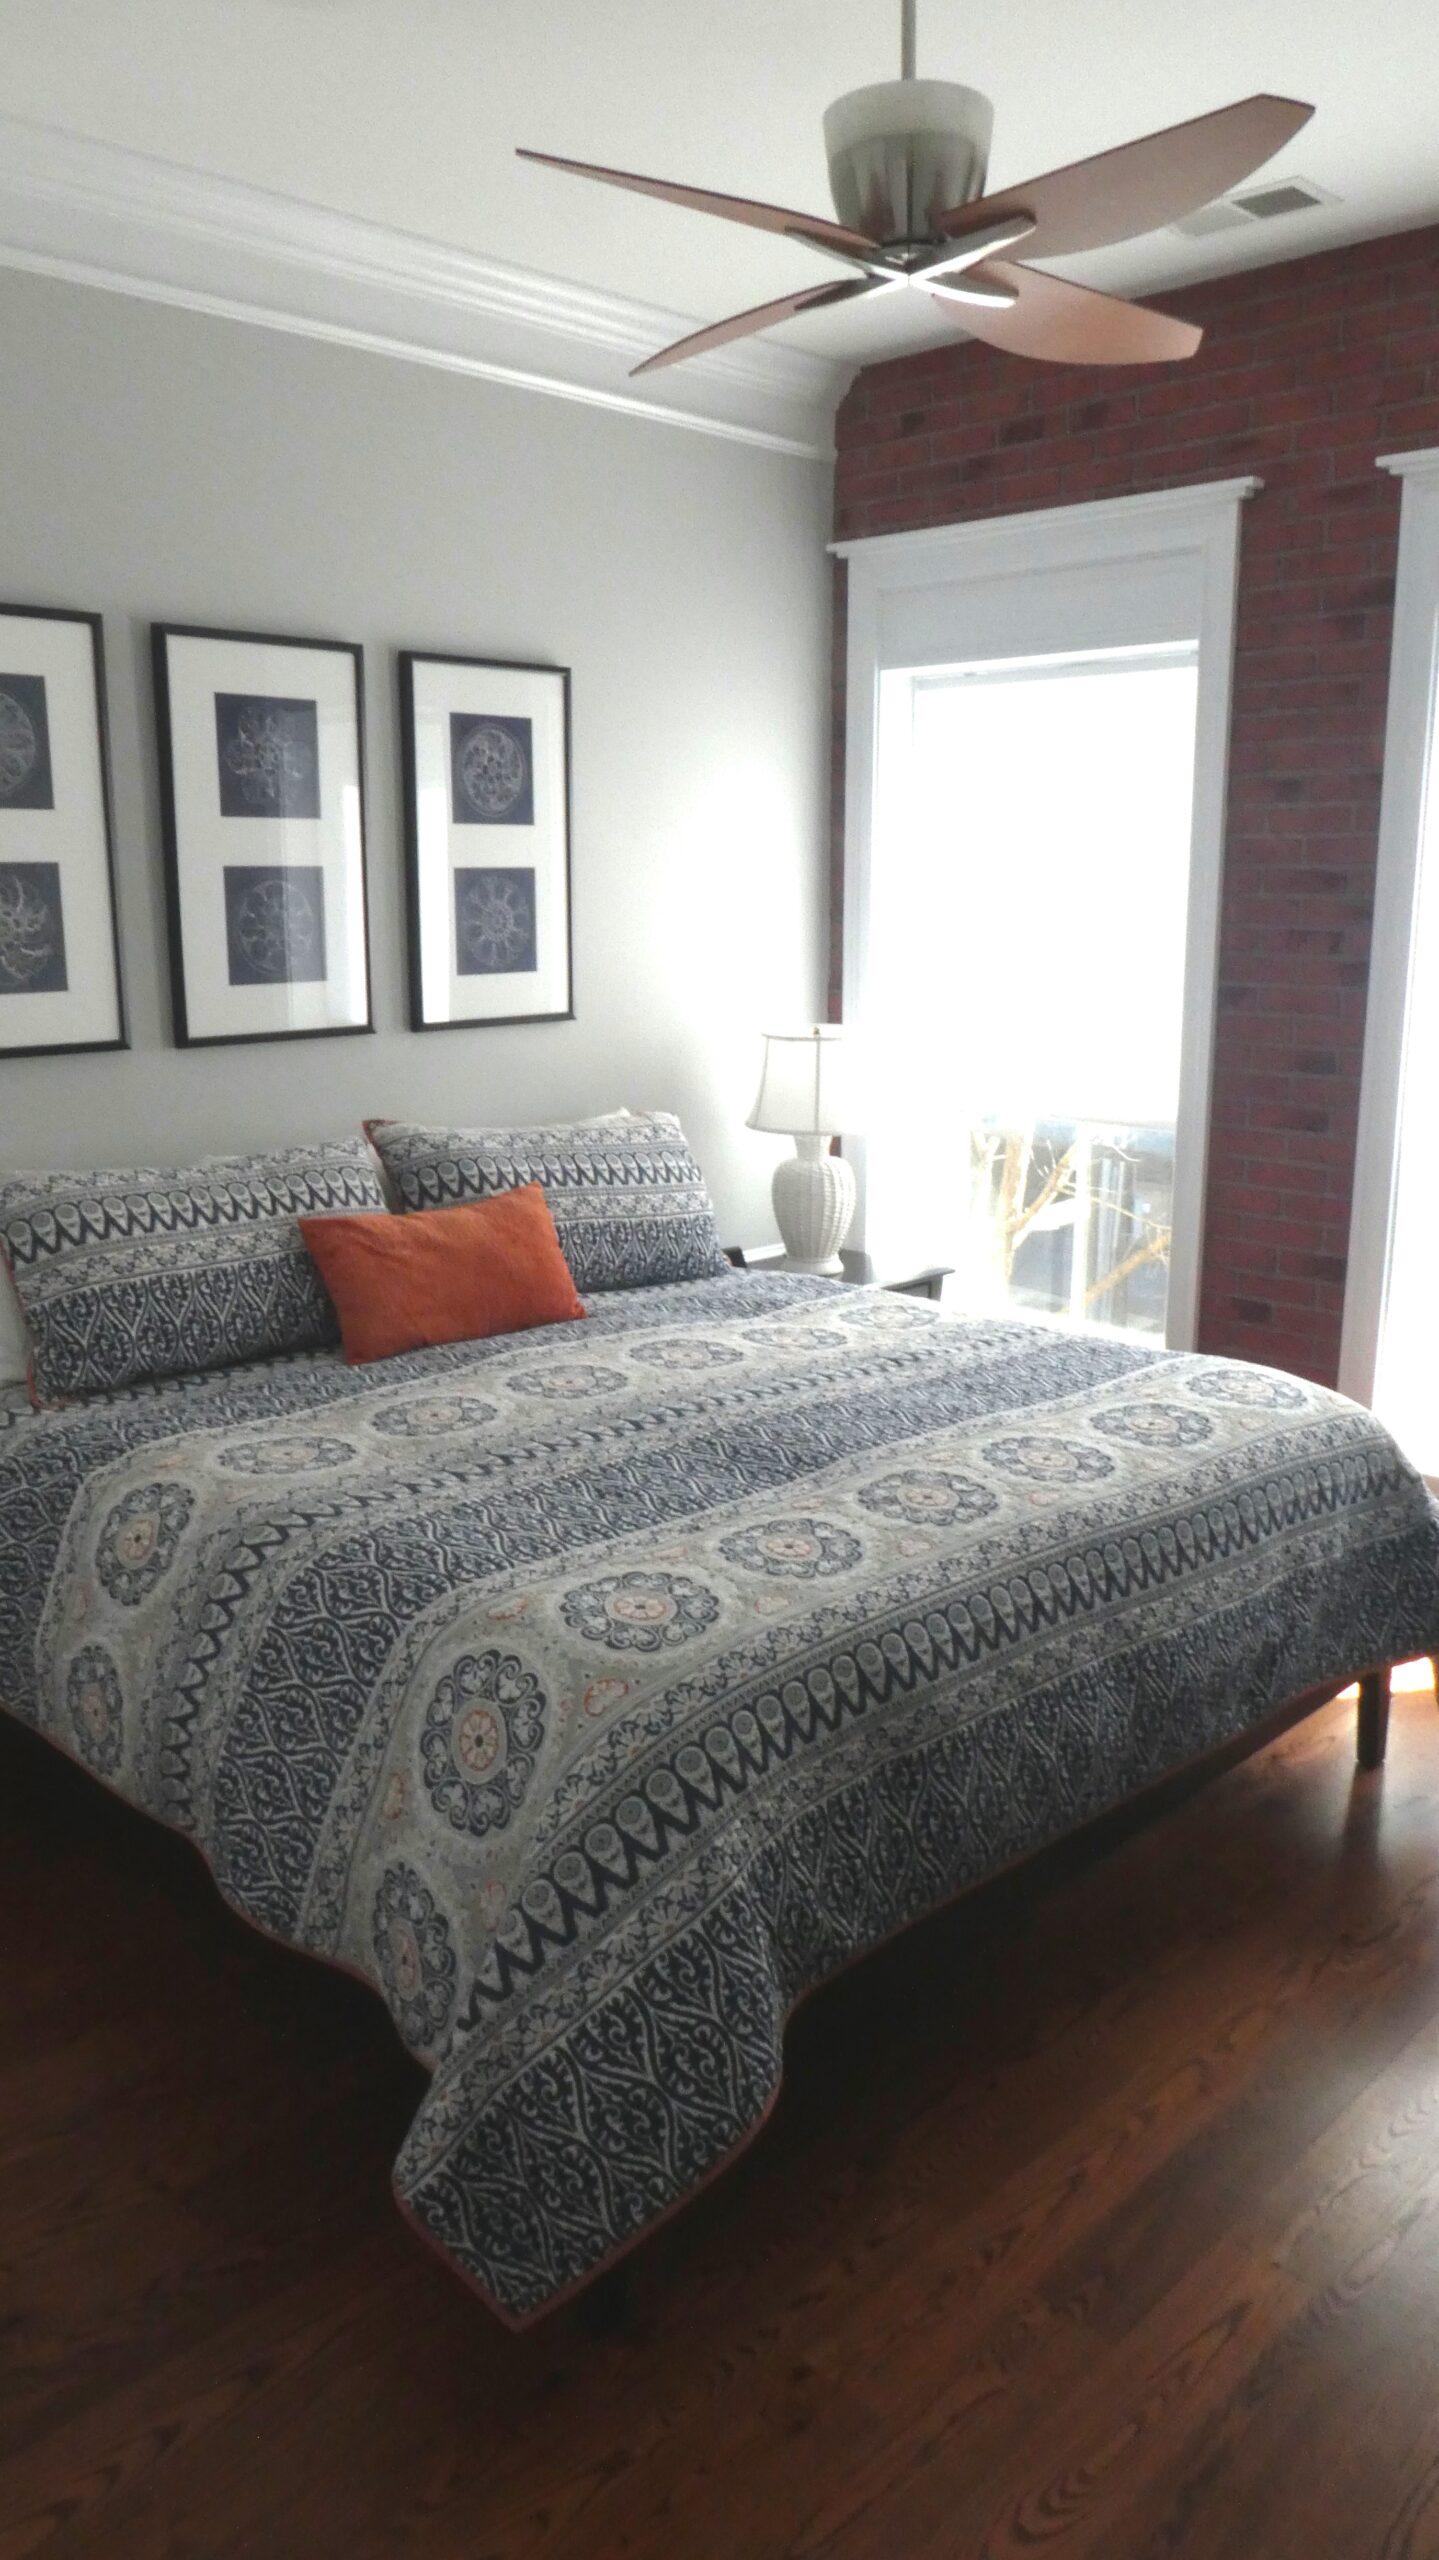 Bedroom with oversized windows, exposed brick wall and dark oak floors